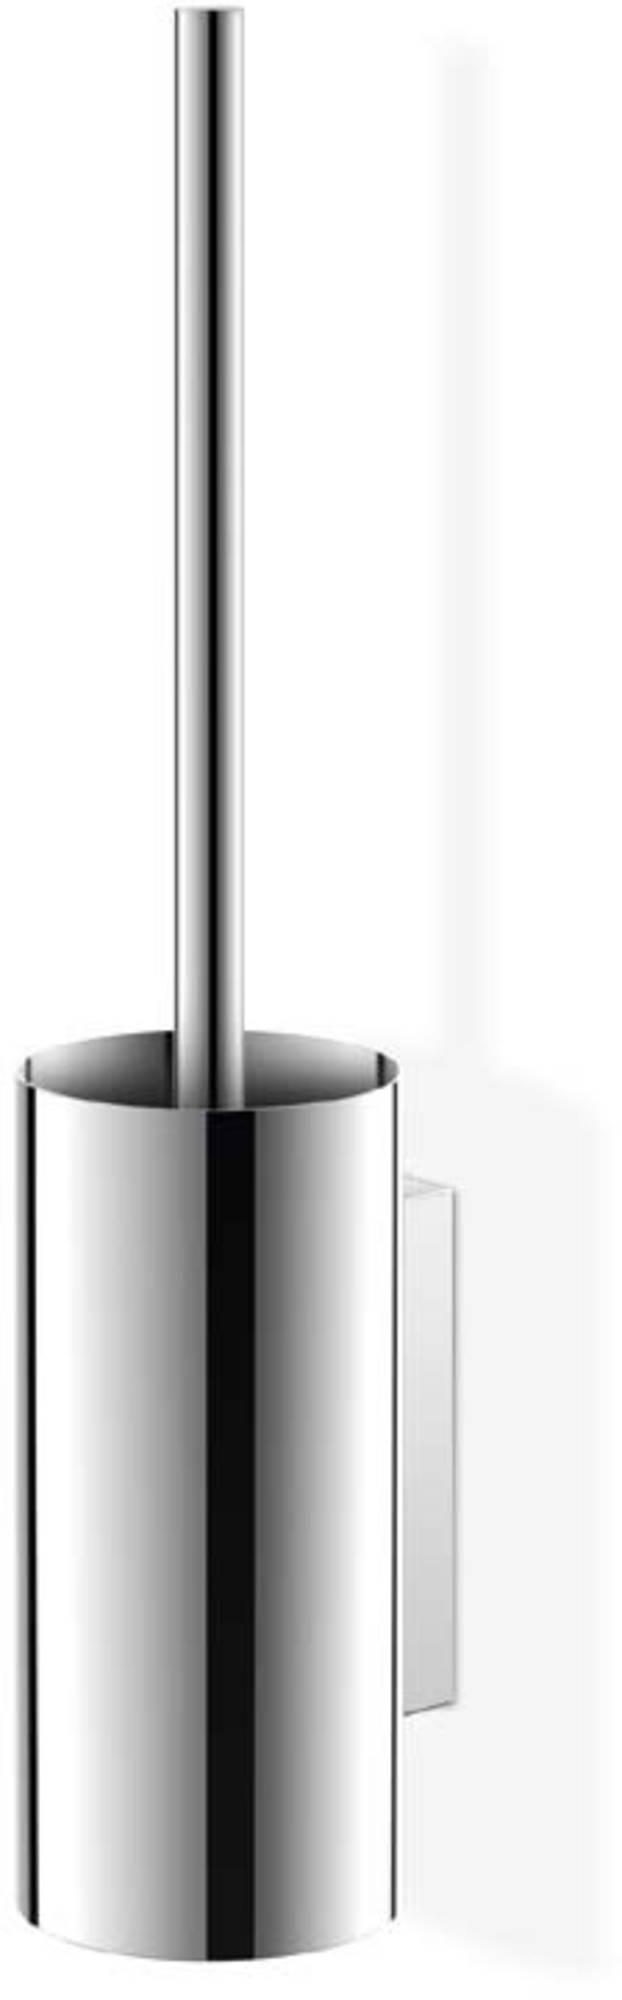 ZACK Linea Toiletborstel Spiegelglans RVS